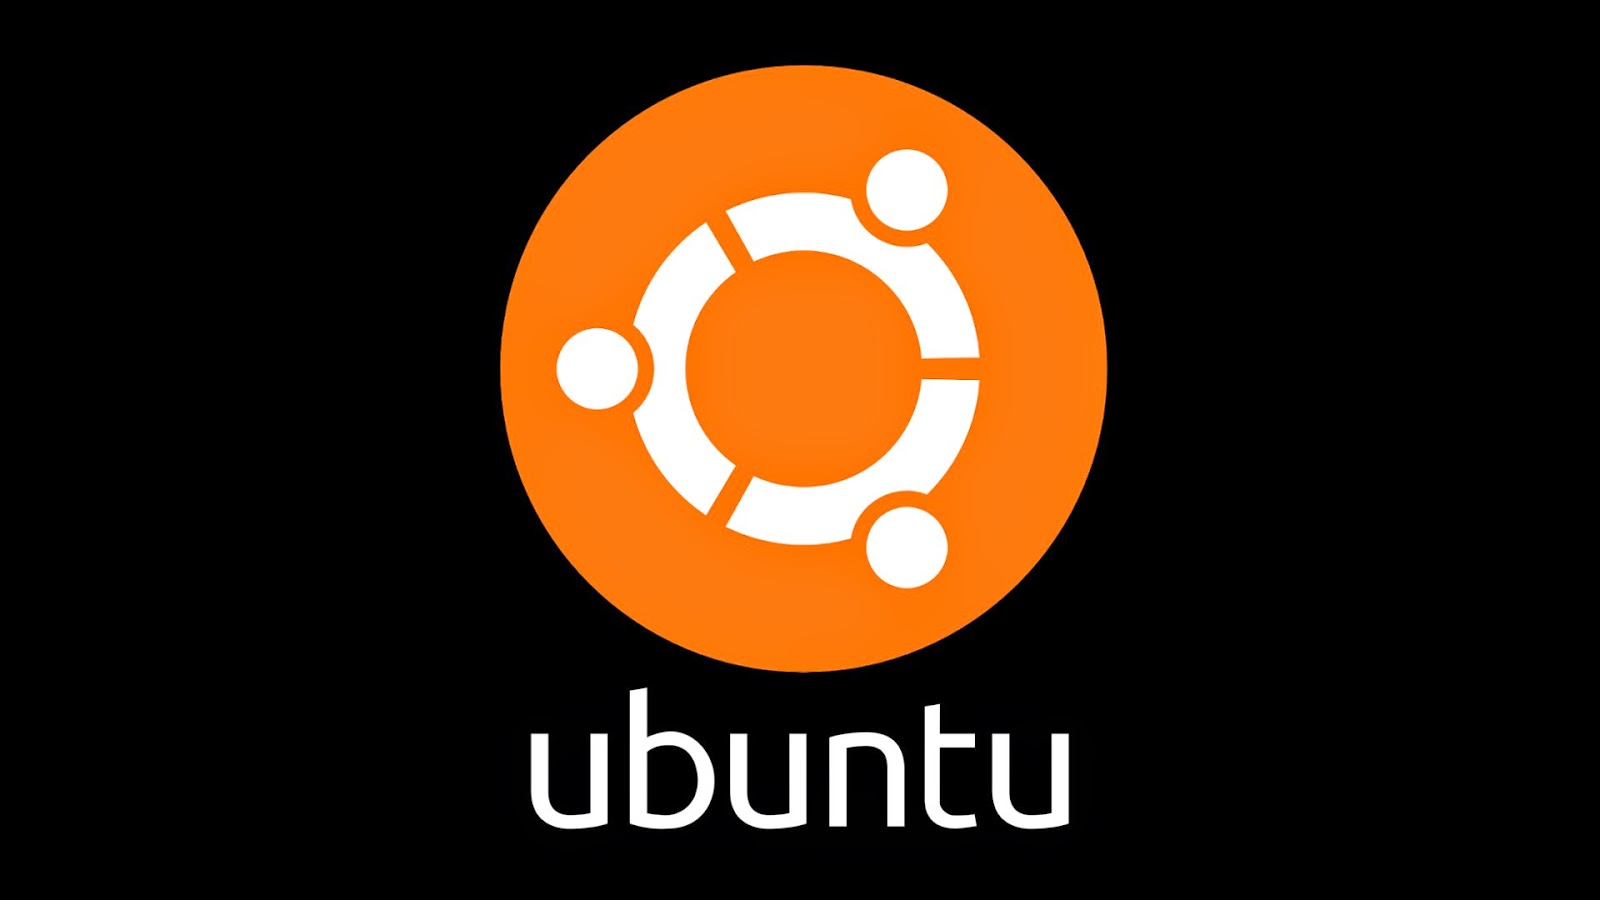 ubuntu downlad